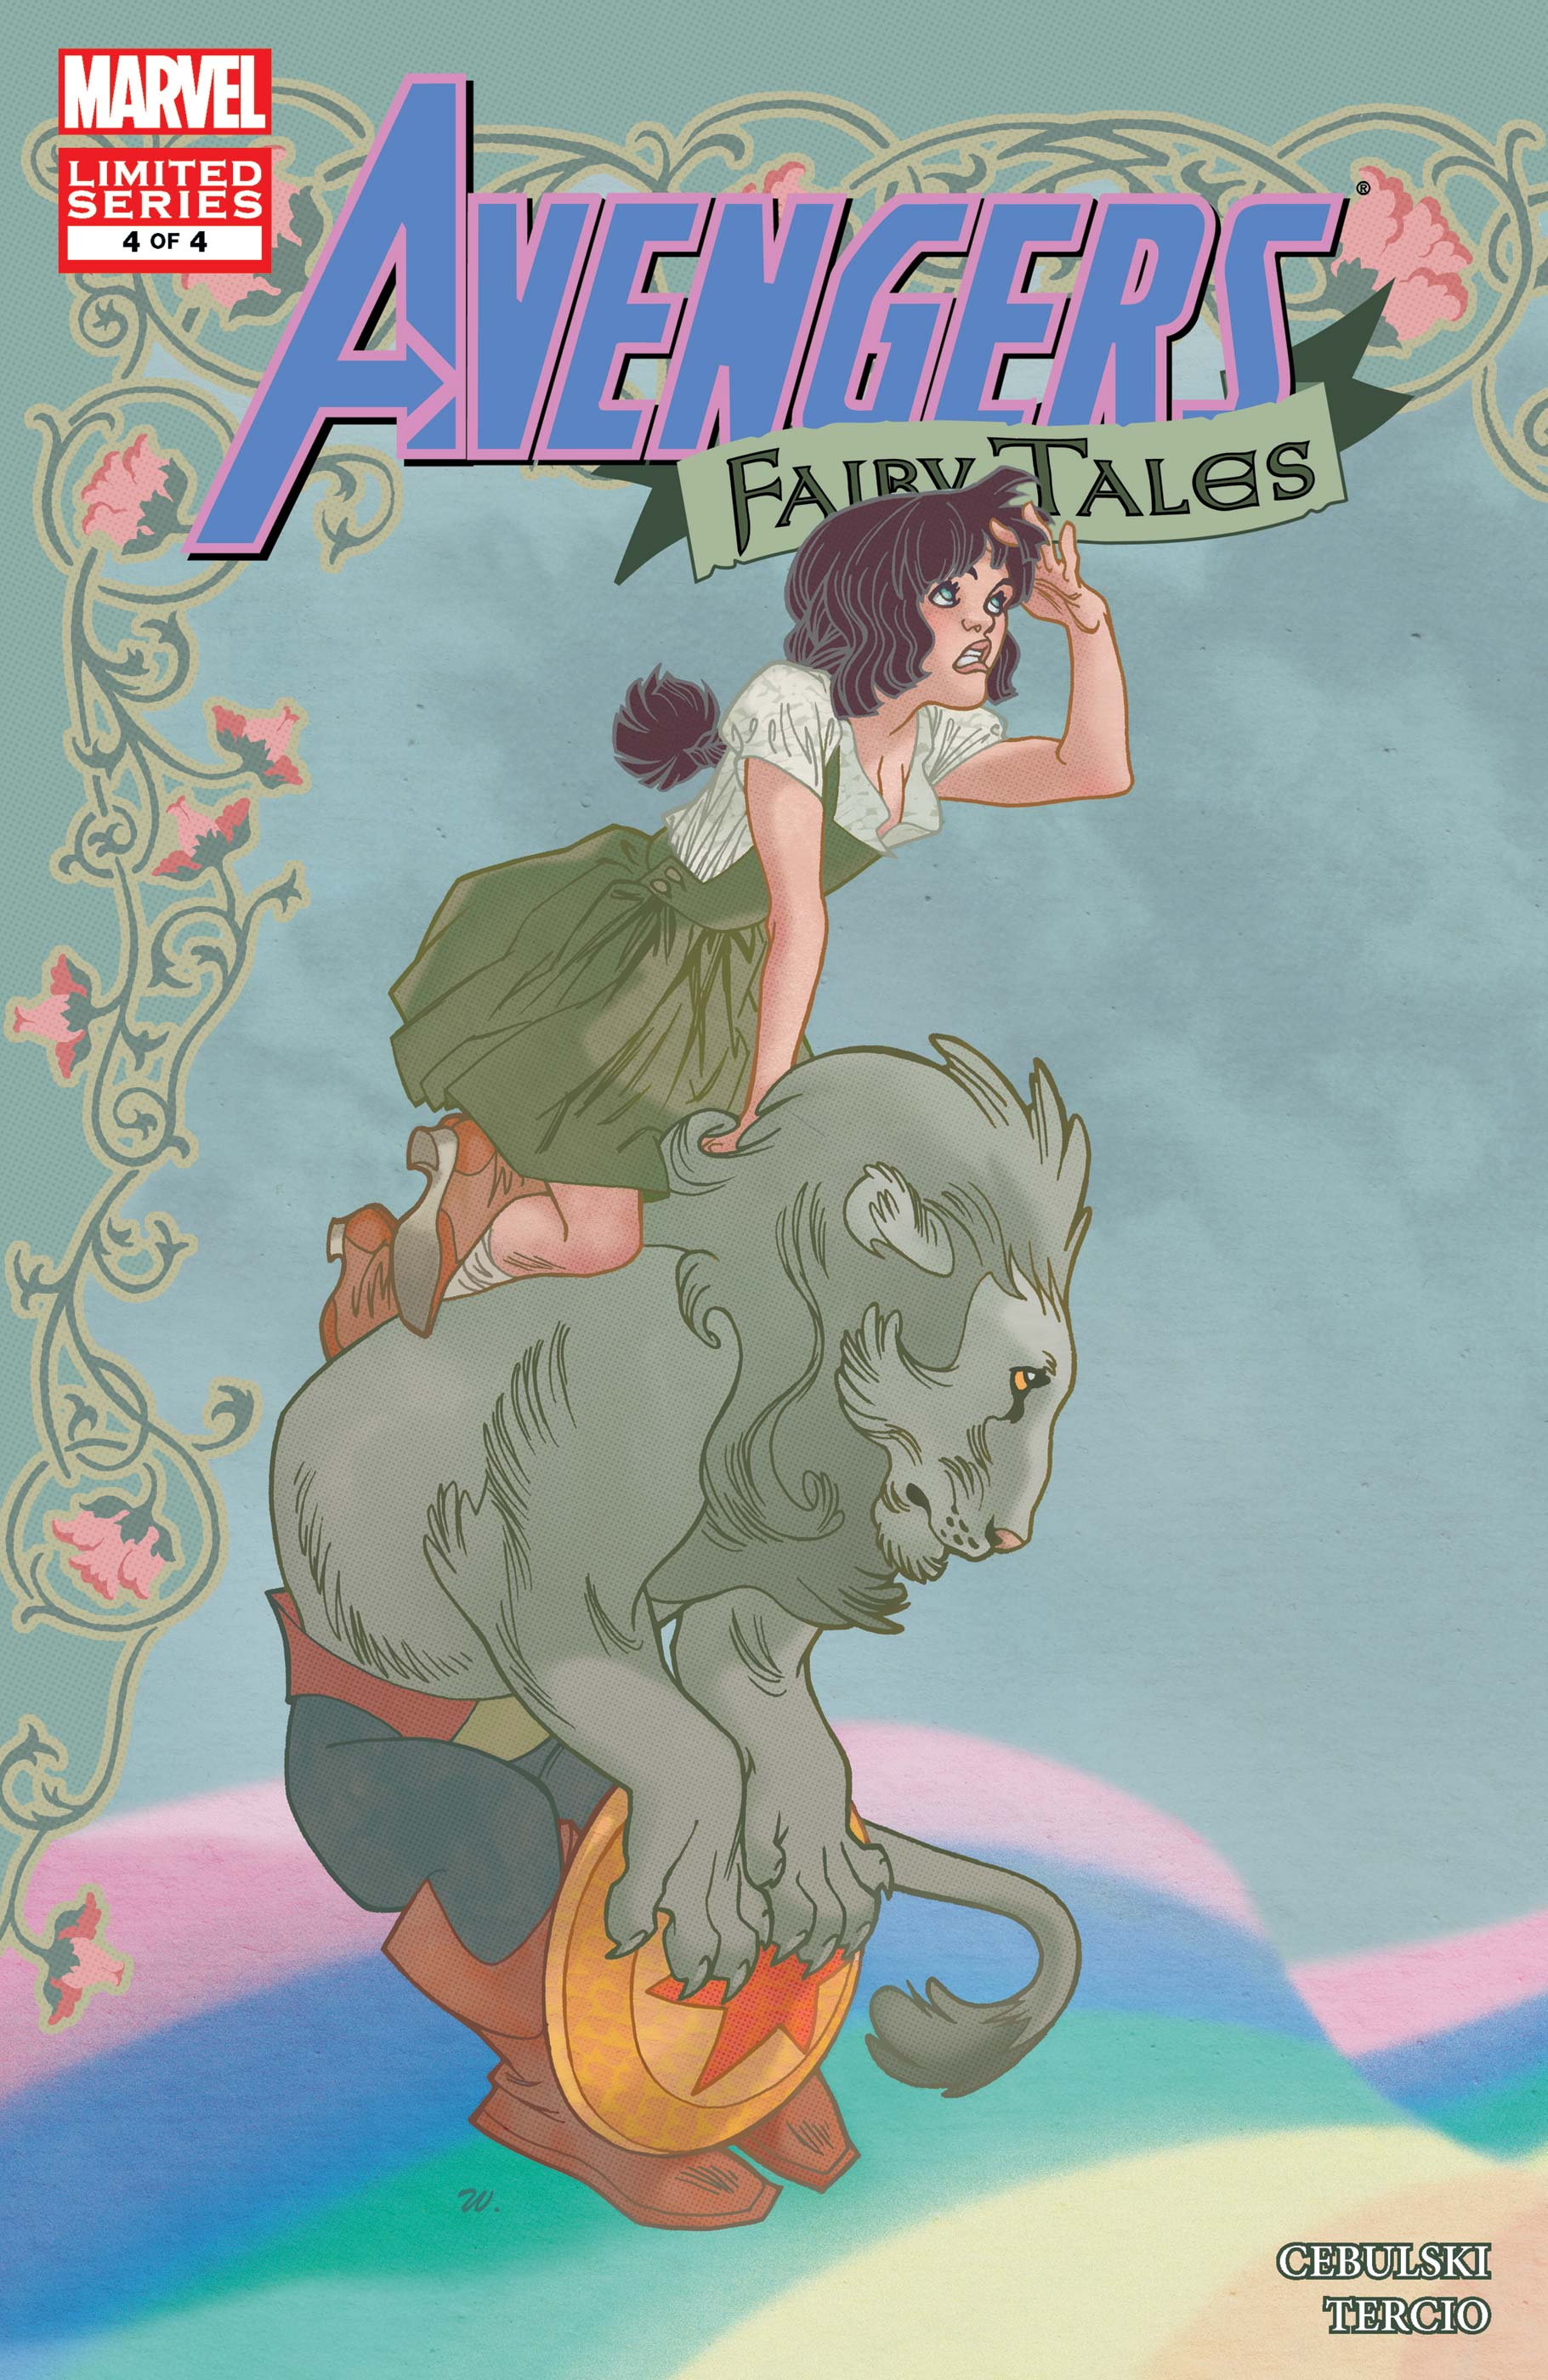 Avengers Fairy Tales (2008) #4